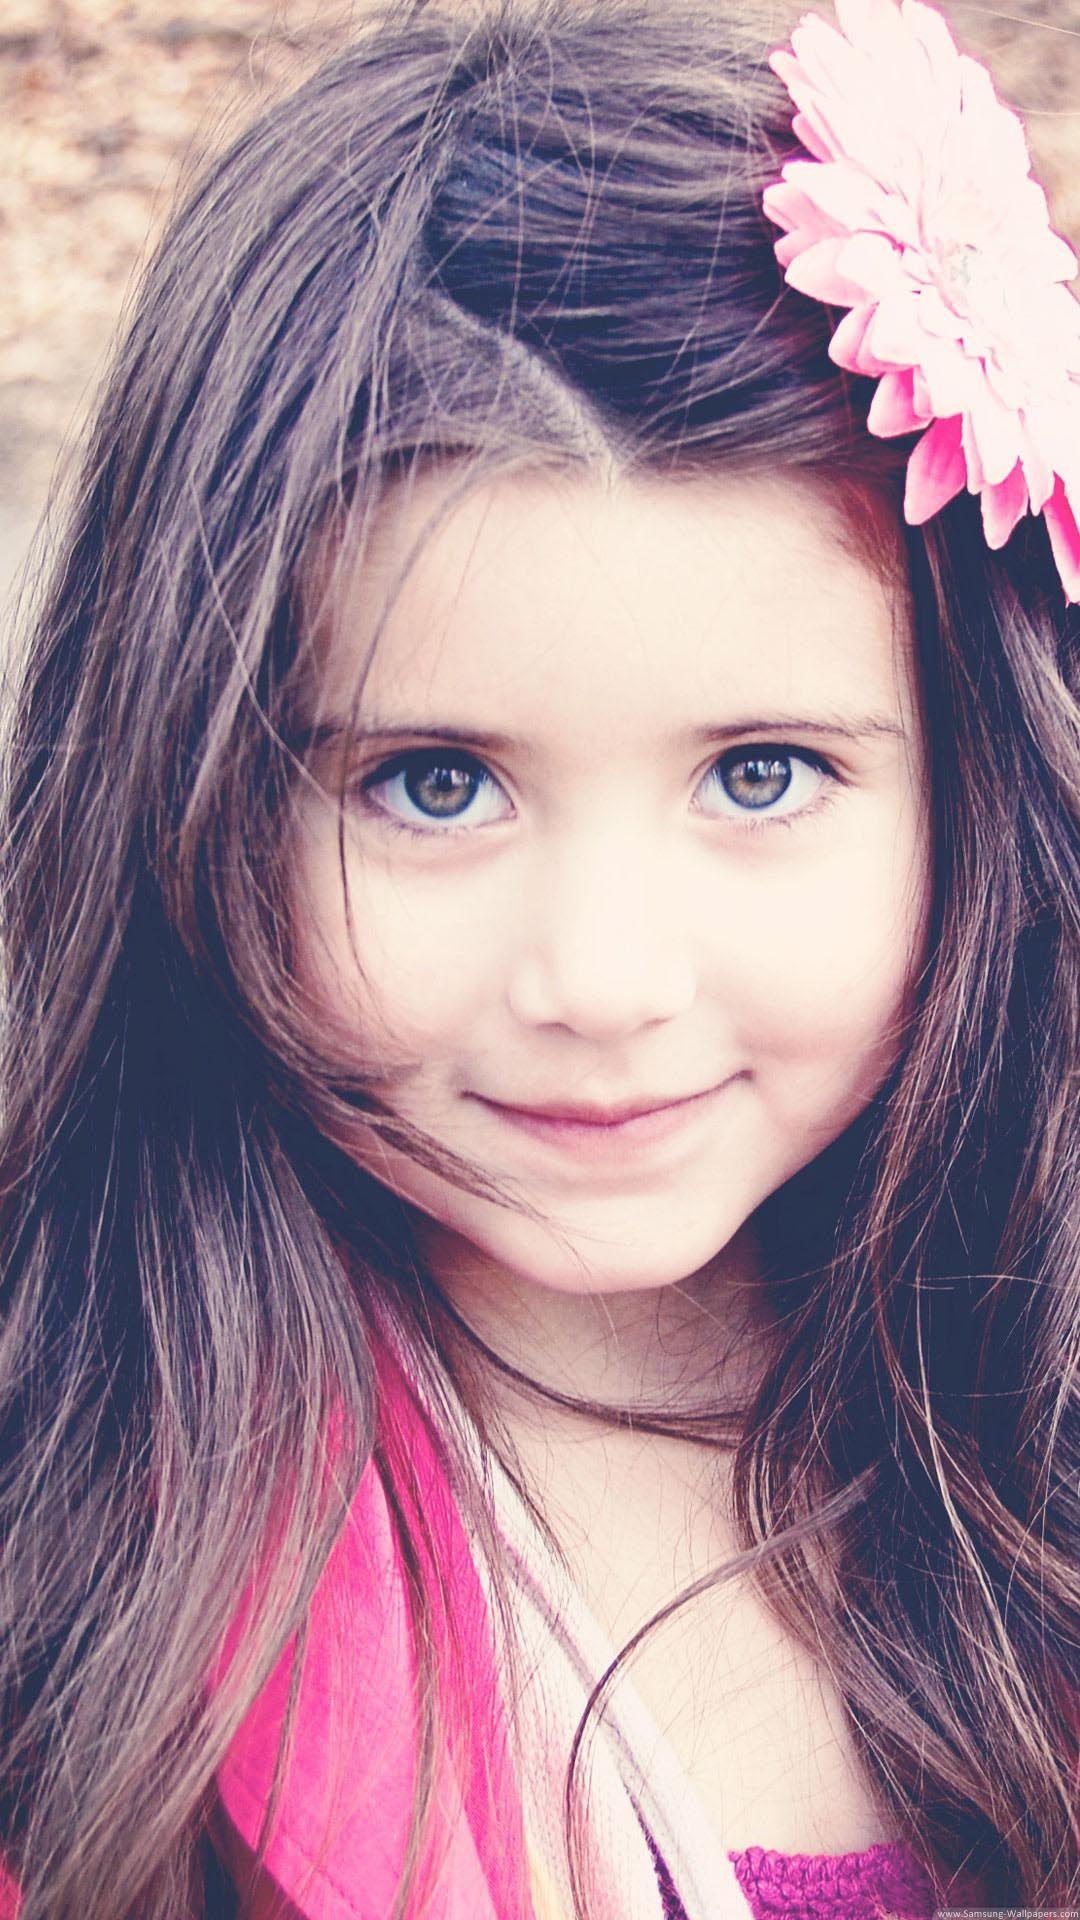 Wallpaper iphone girl hd - Very Beautiful Girls In The World Wallpaper Iphone Hd Cute Girl